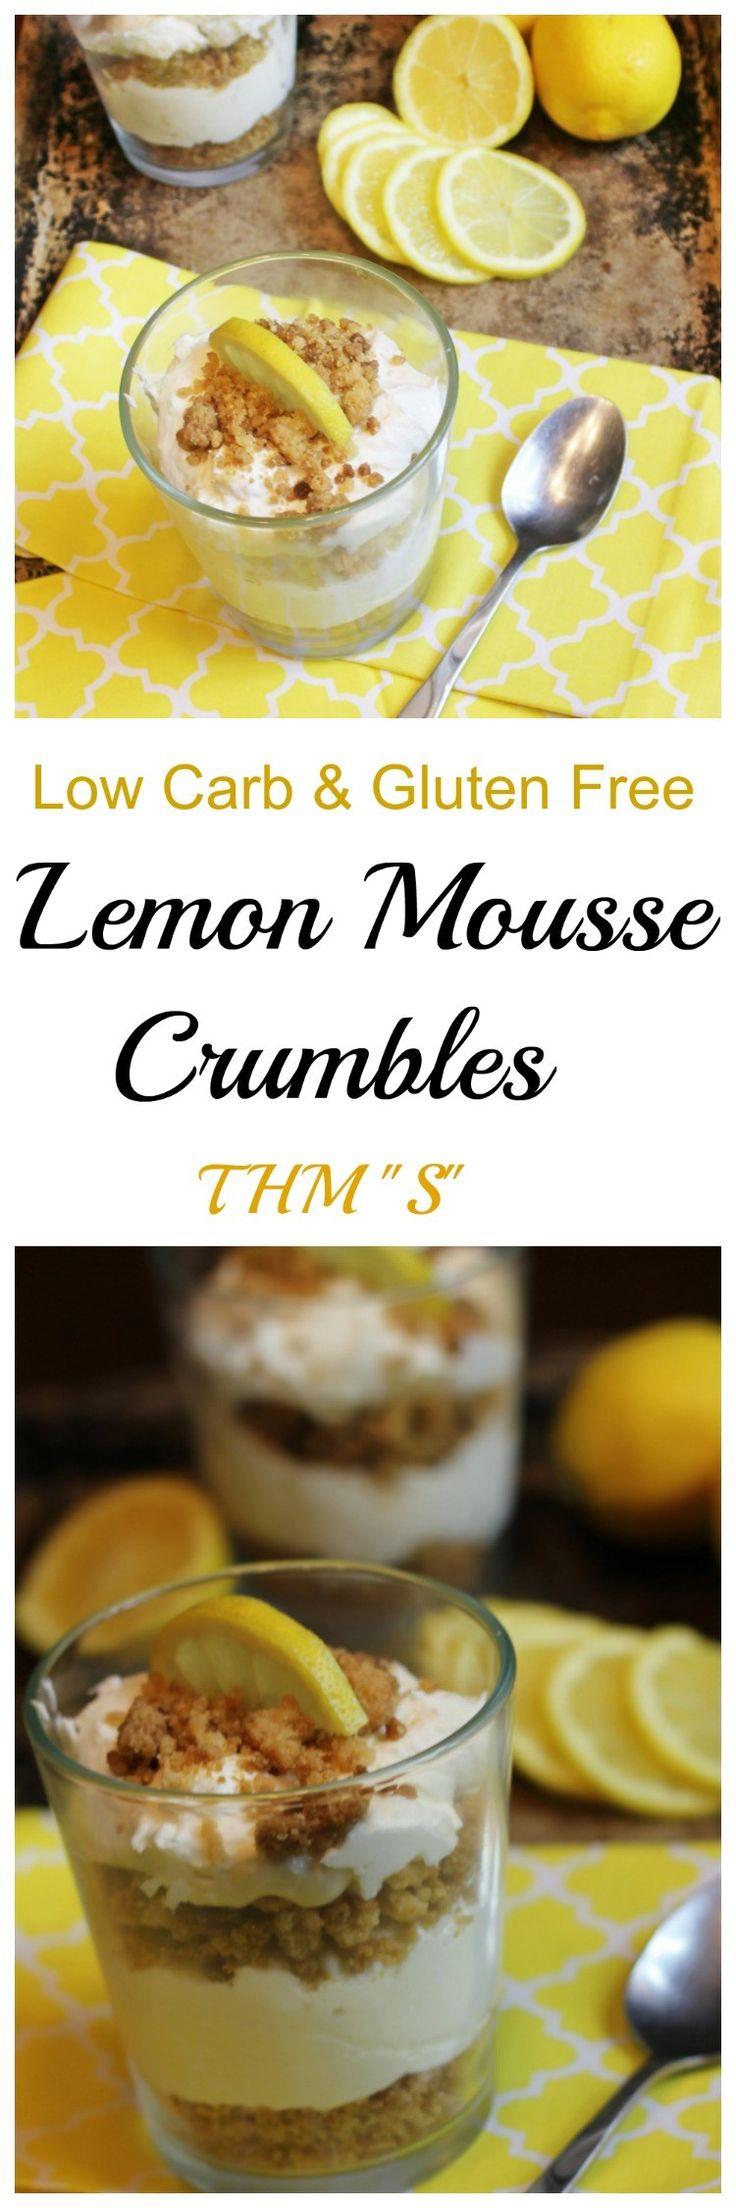 Lemon Mousse Crumbles || Lemon Desserts, Low Carb, Sugar Free, Gluten Free, Trim Healthy Mama, Summer Desserts, Easy Desserts